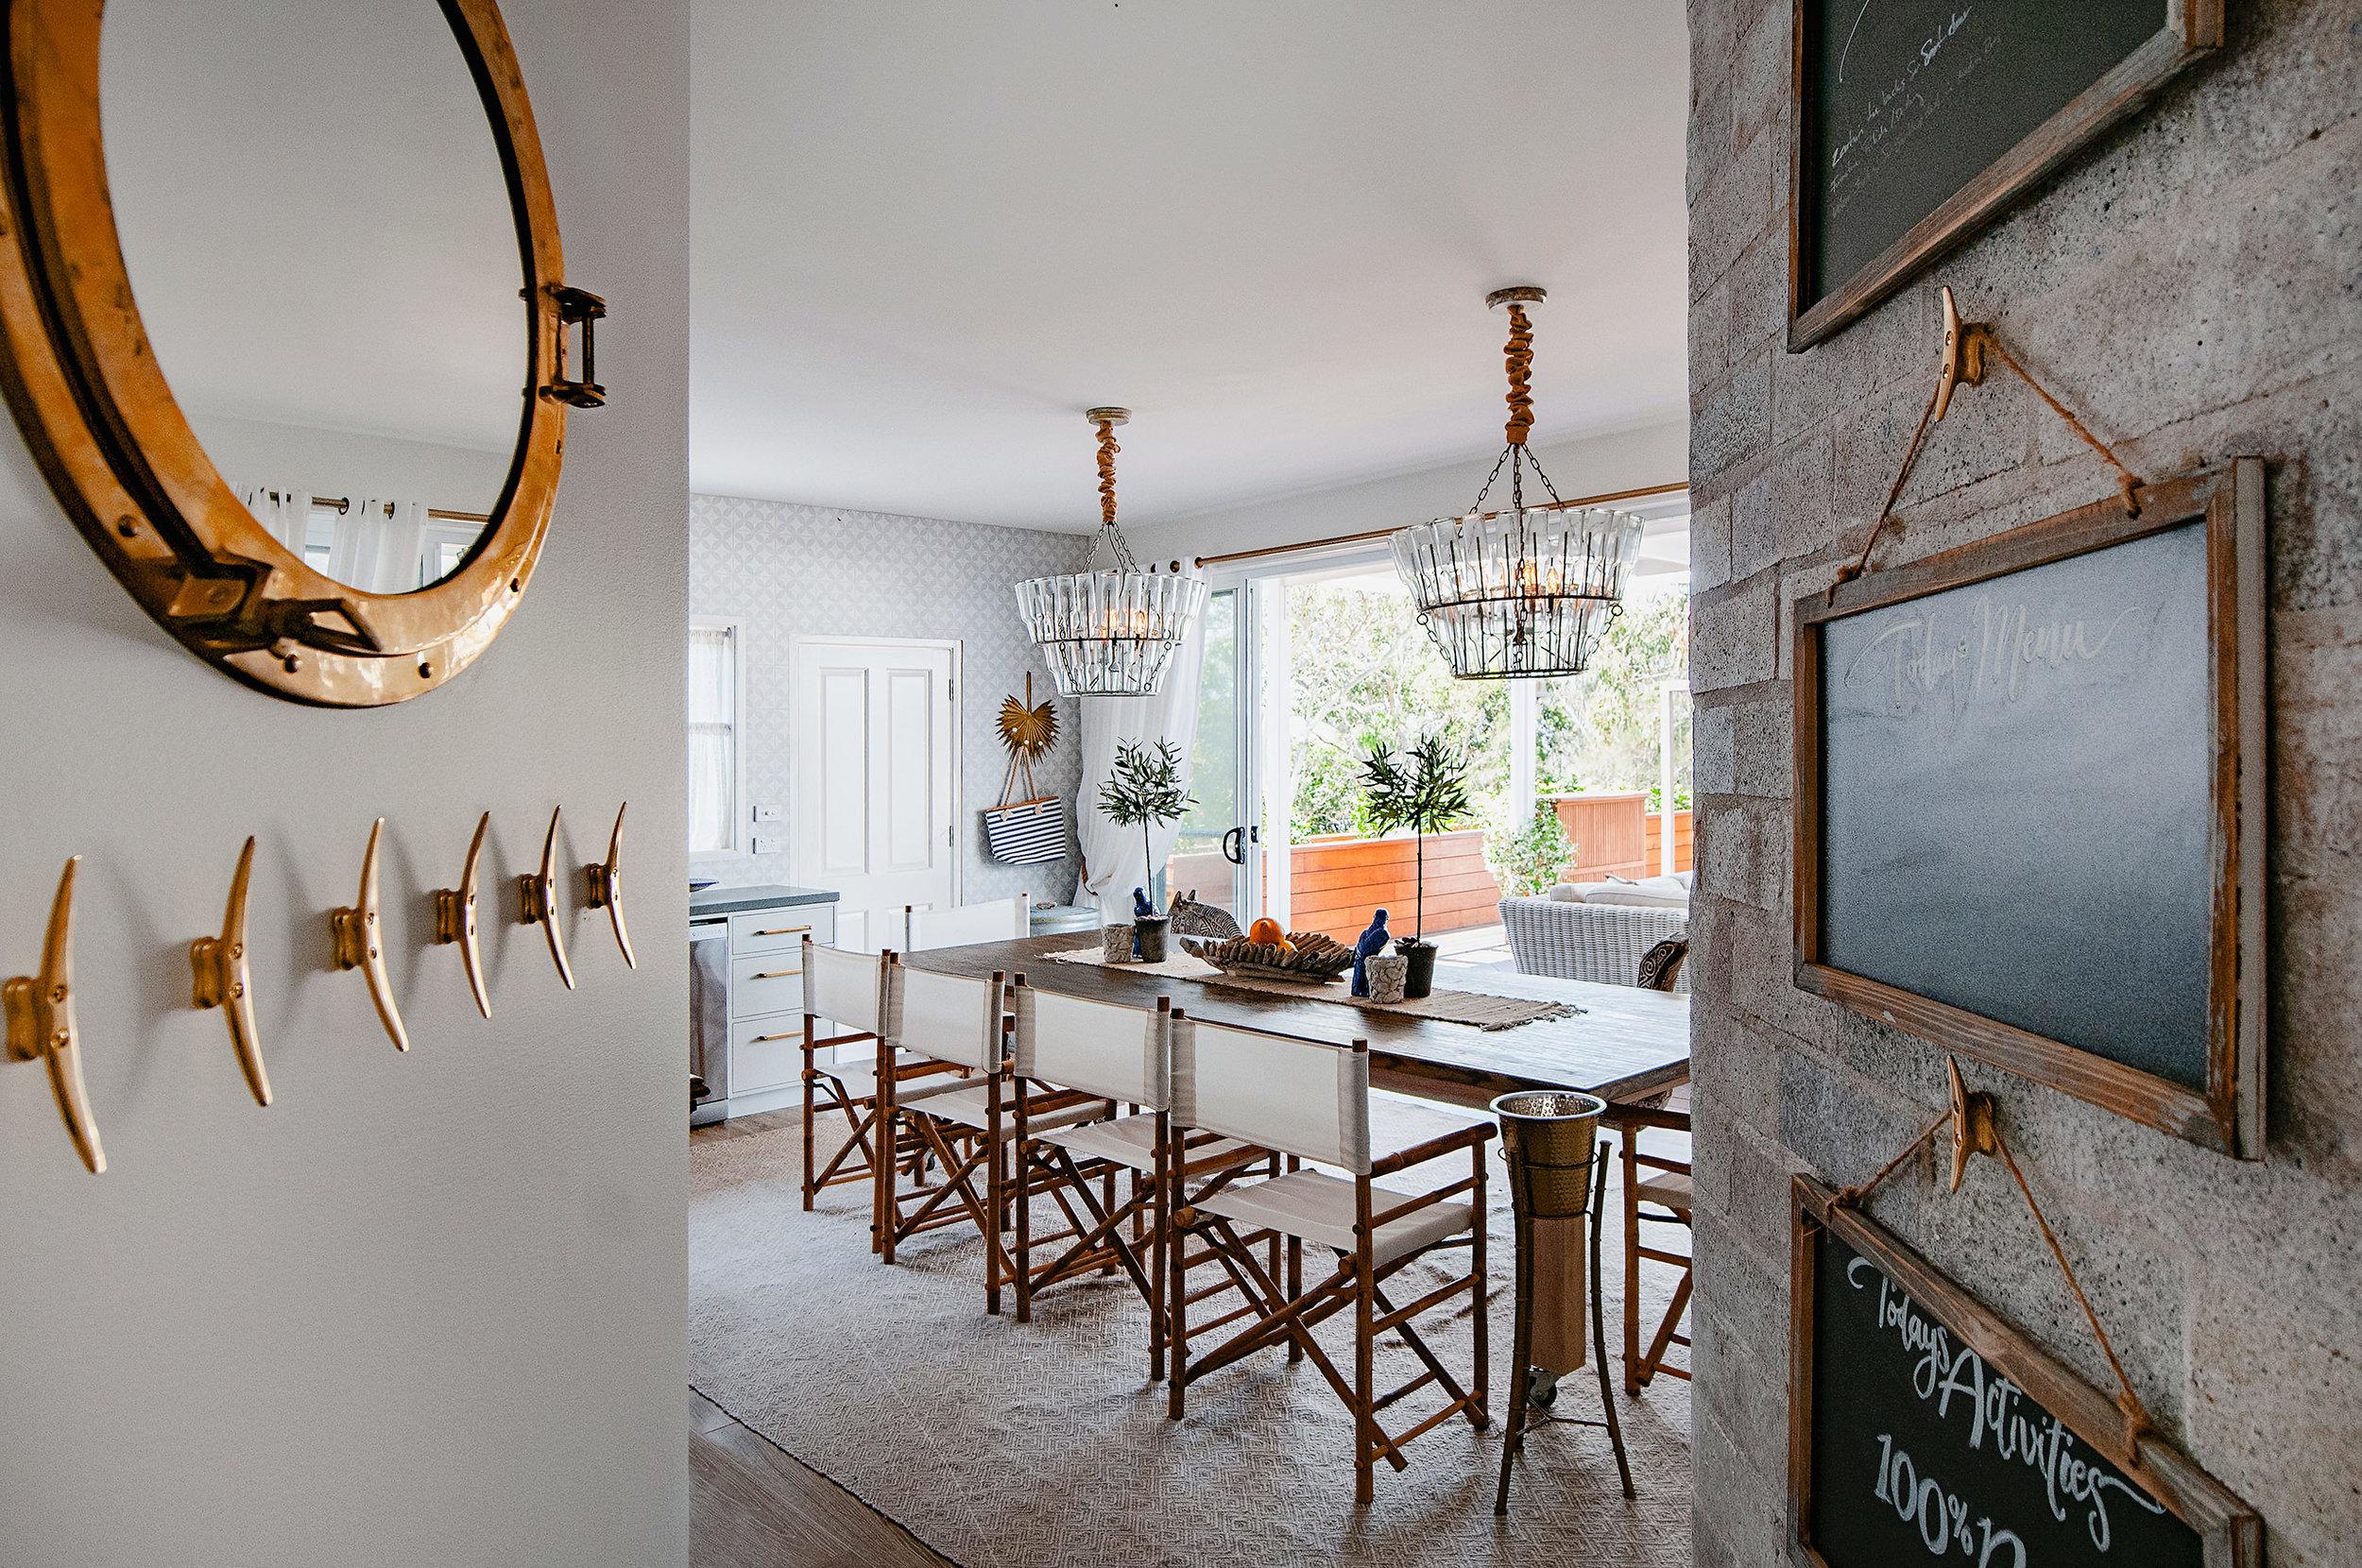 Barellen-4-Kitchen-Dining-Table-2018-11-05-12.55.07_Filtered.jpg